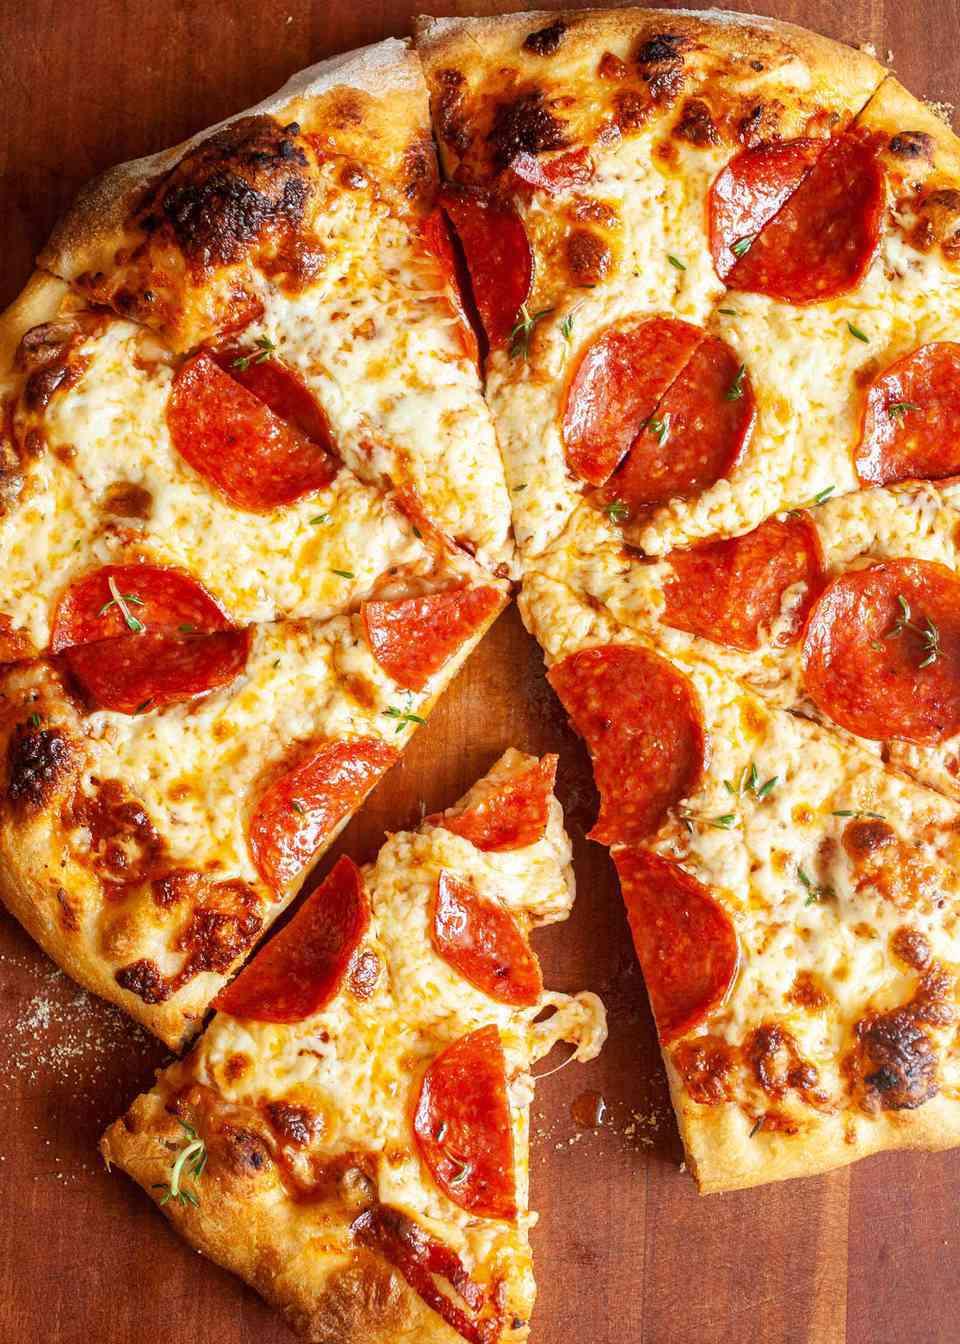 Homemade pepperoni pizza pie